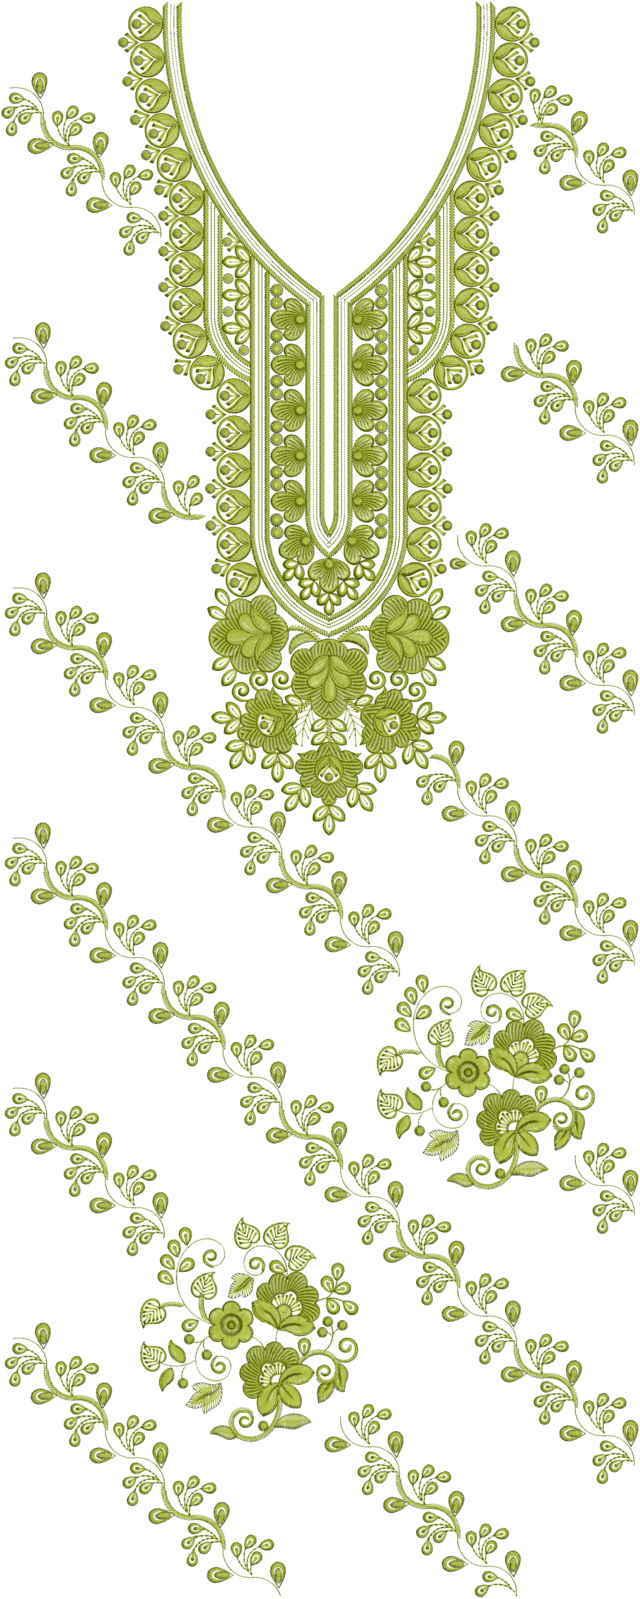 panjabi Single head Top & Duppata Embroidery Design